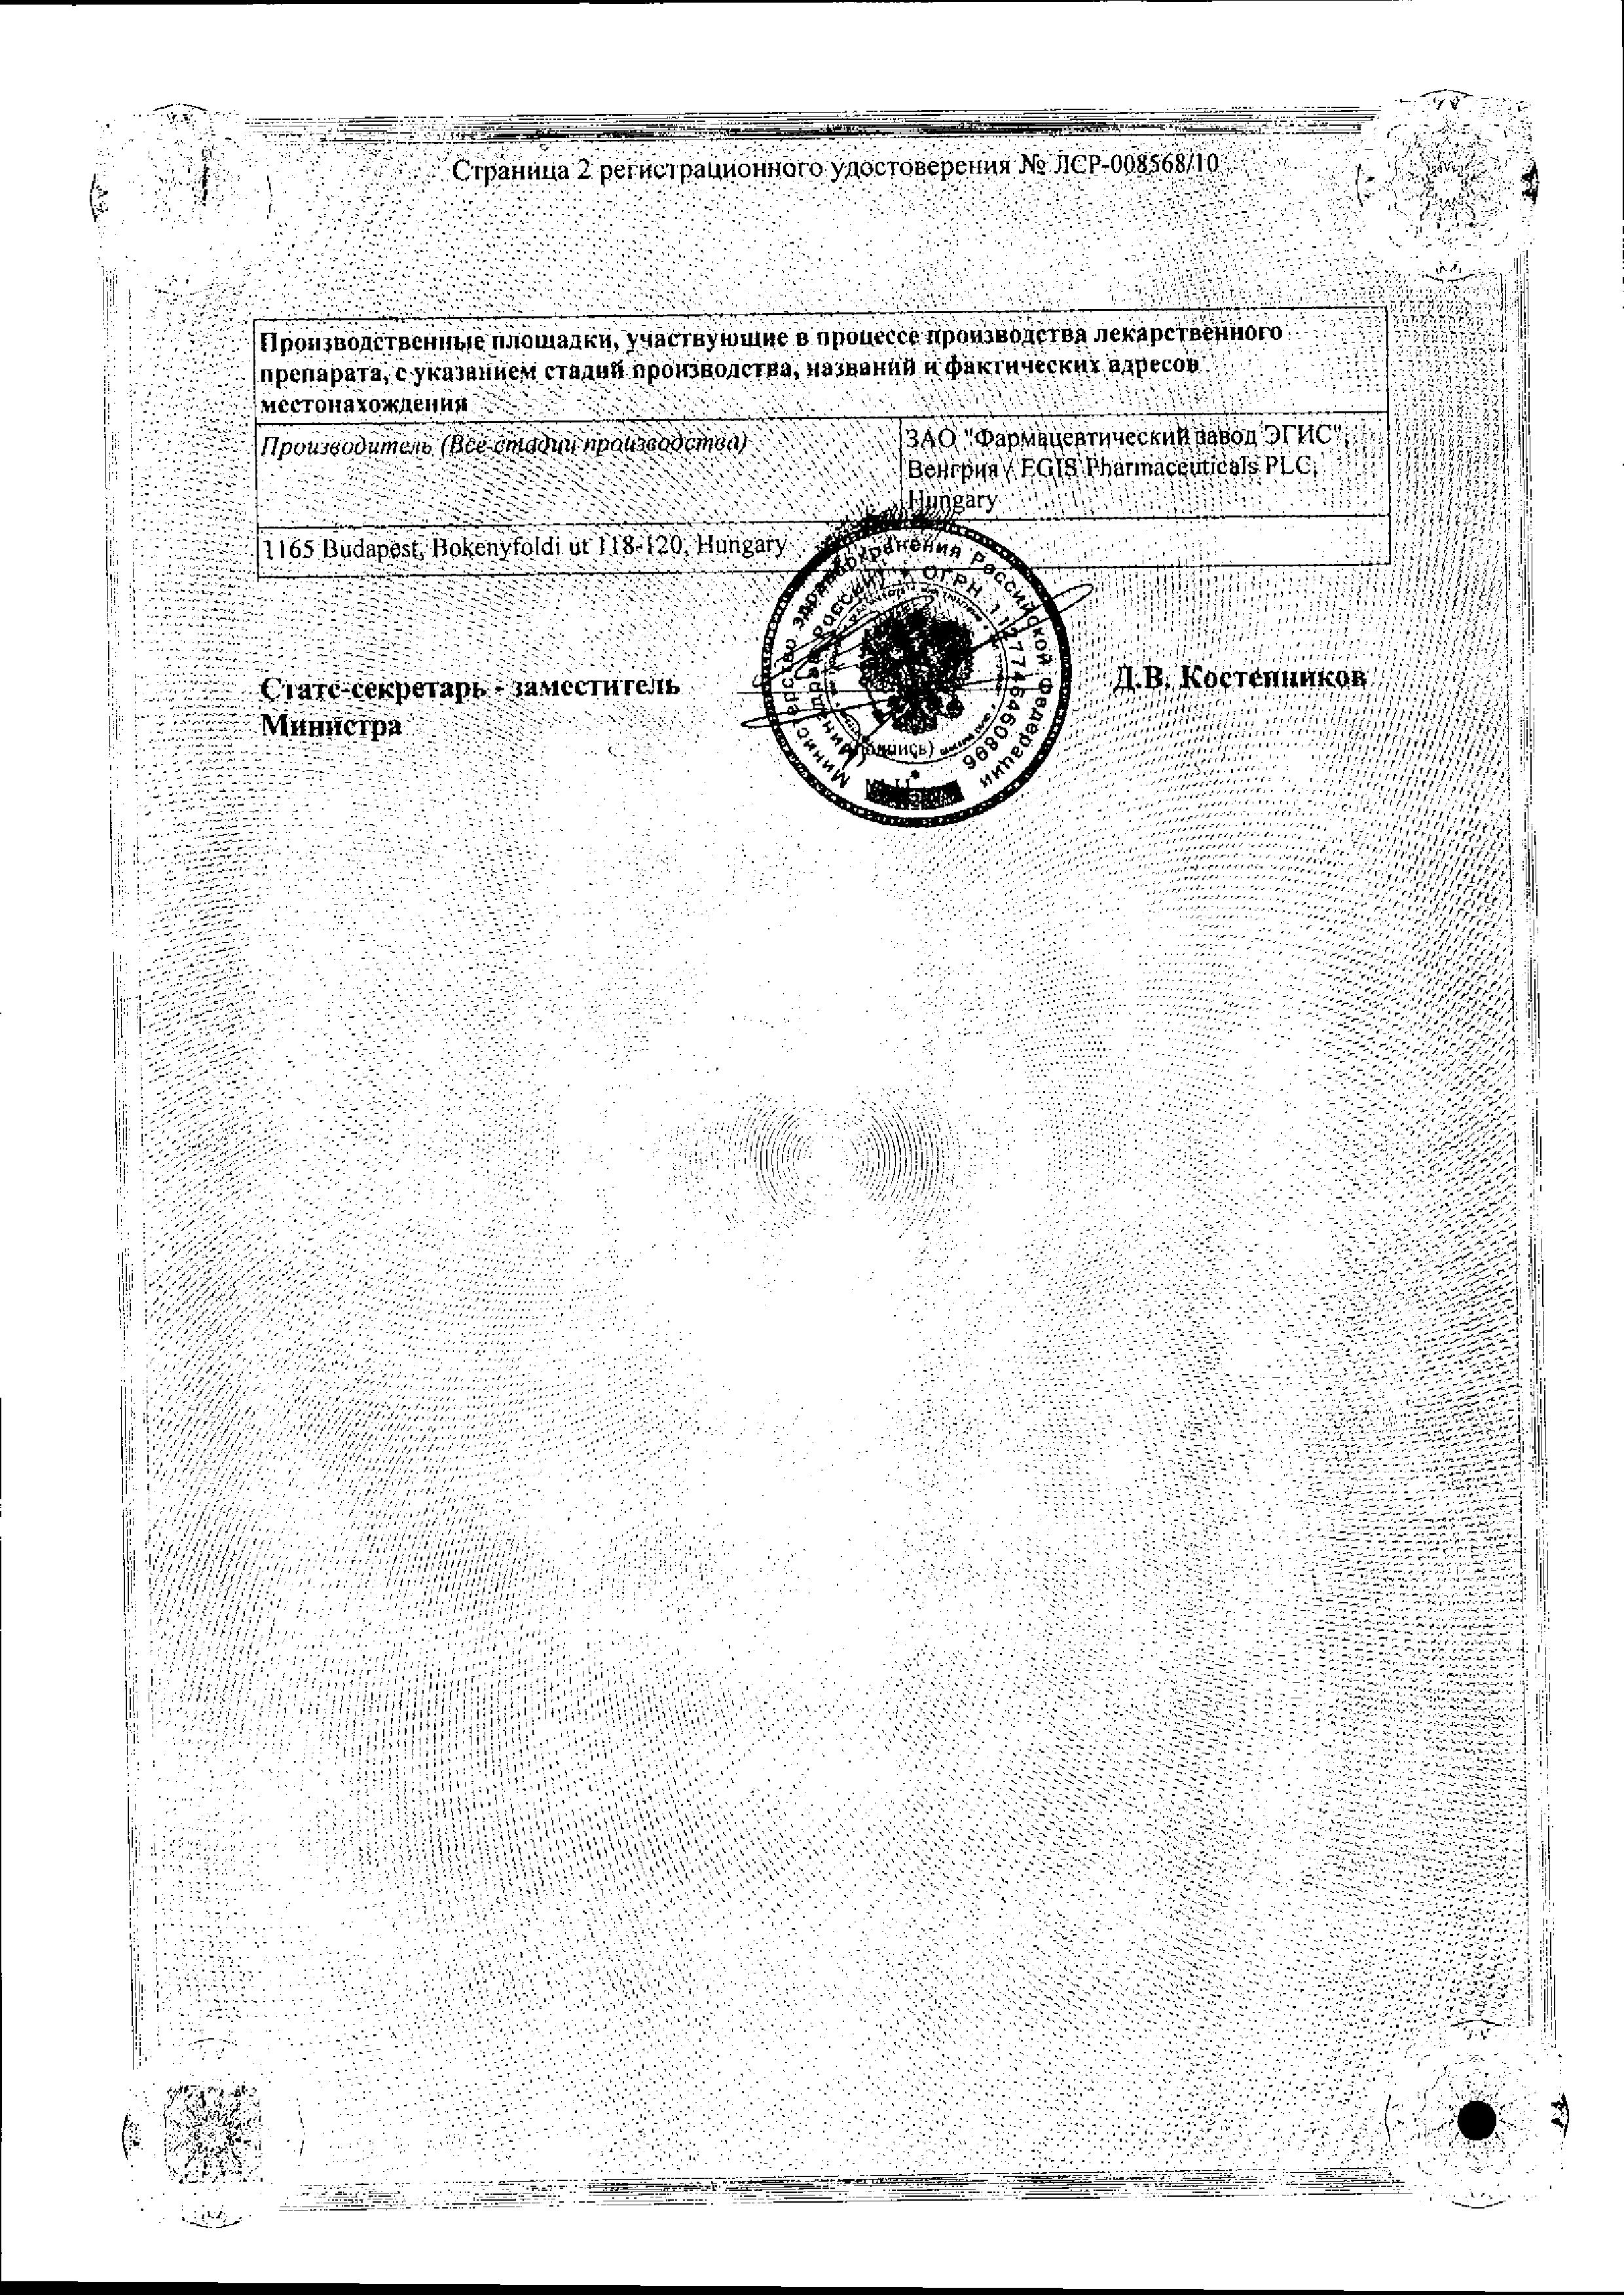 Супрастинекс сертификат